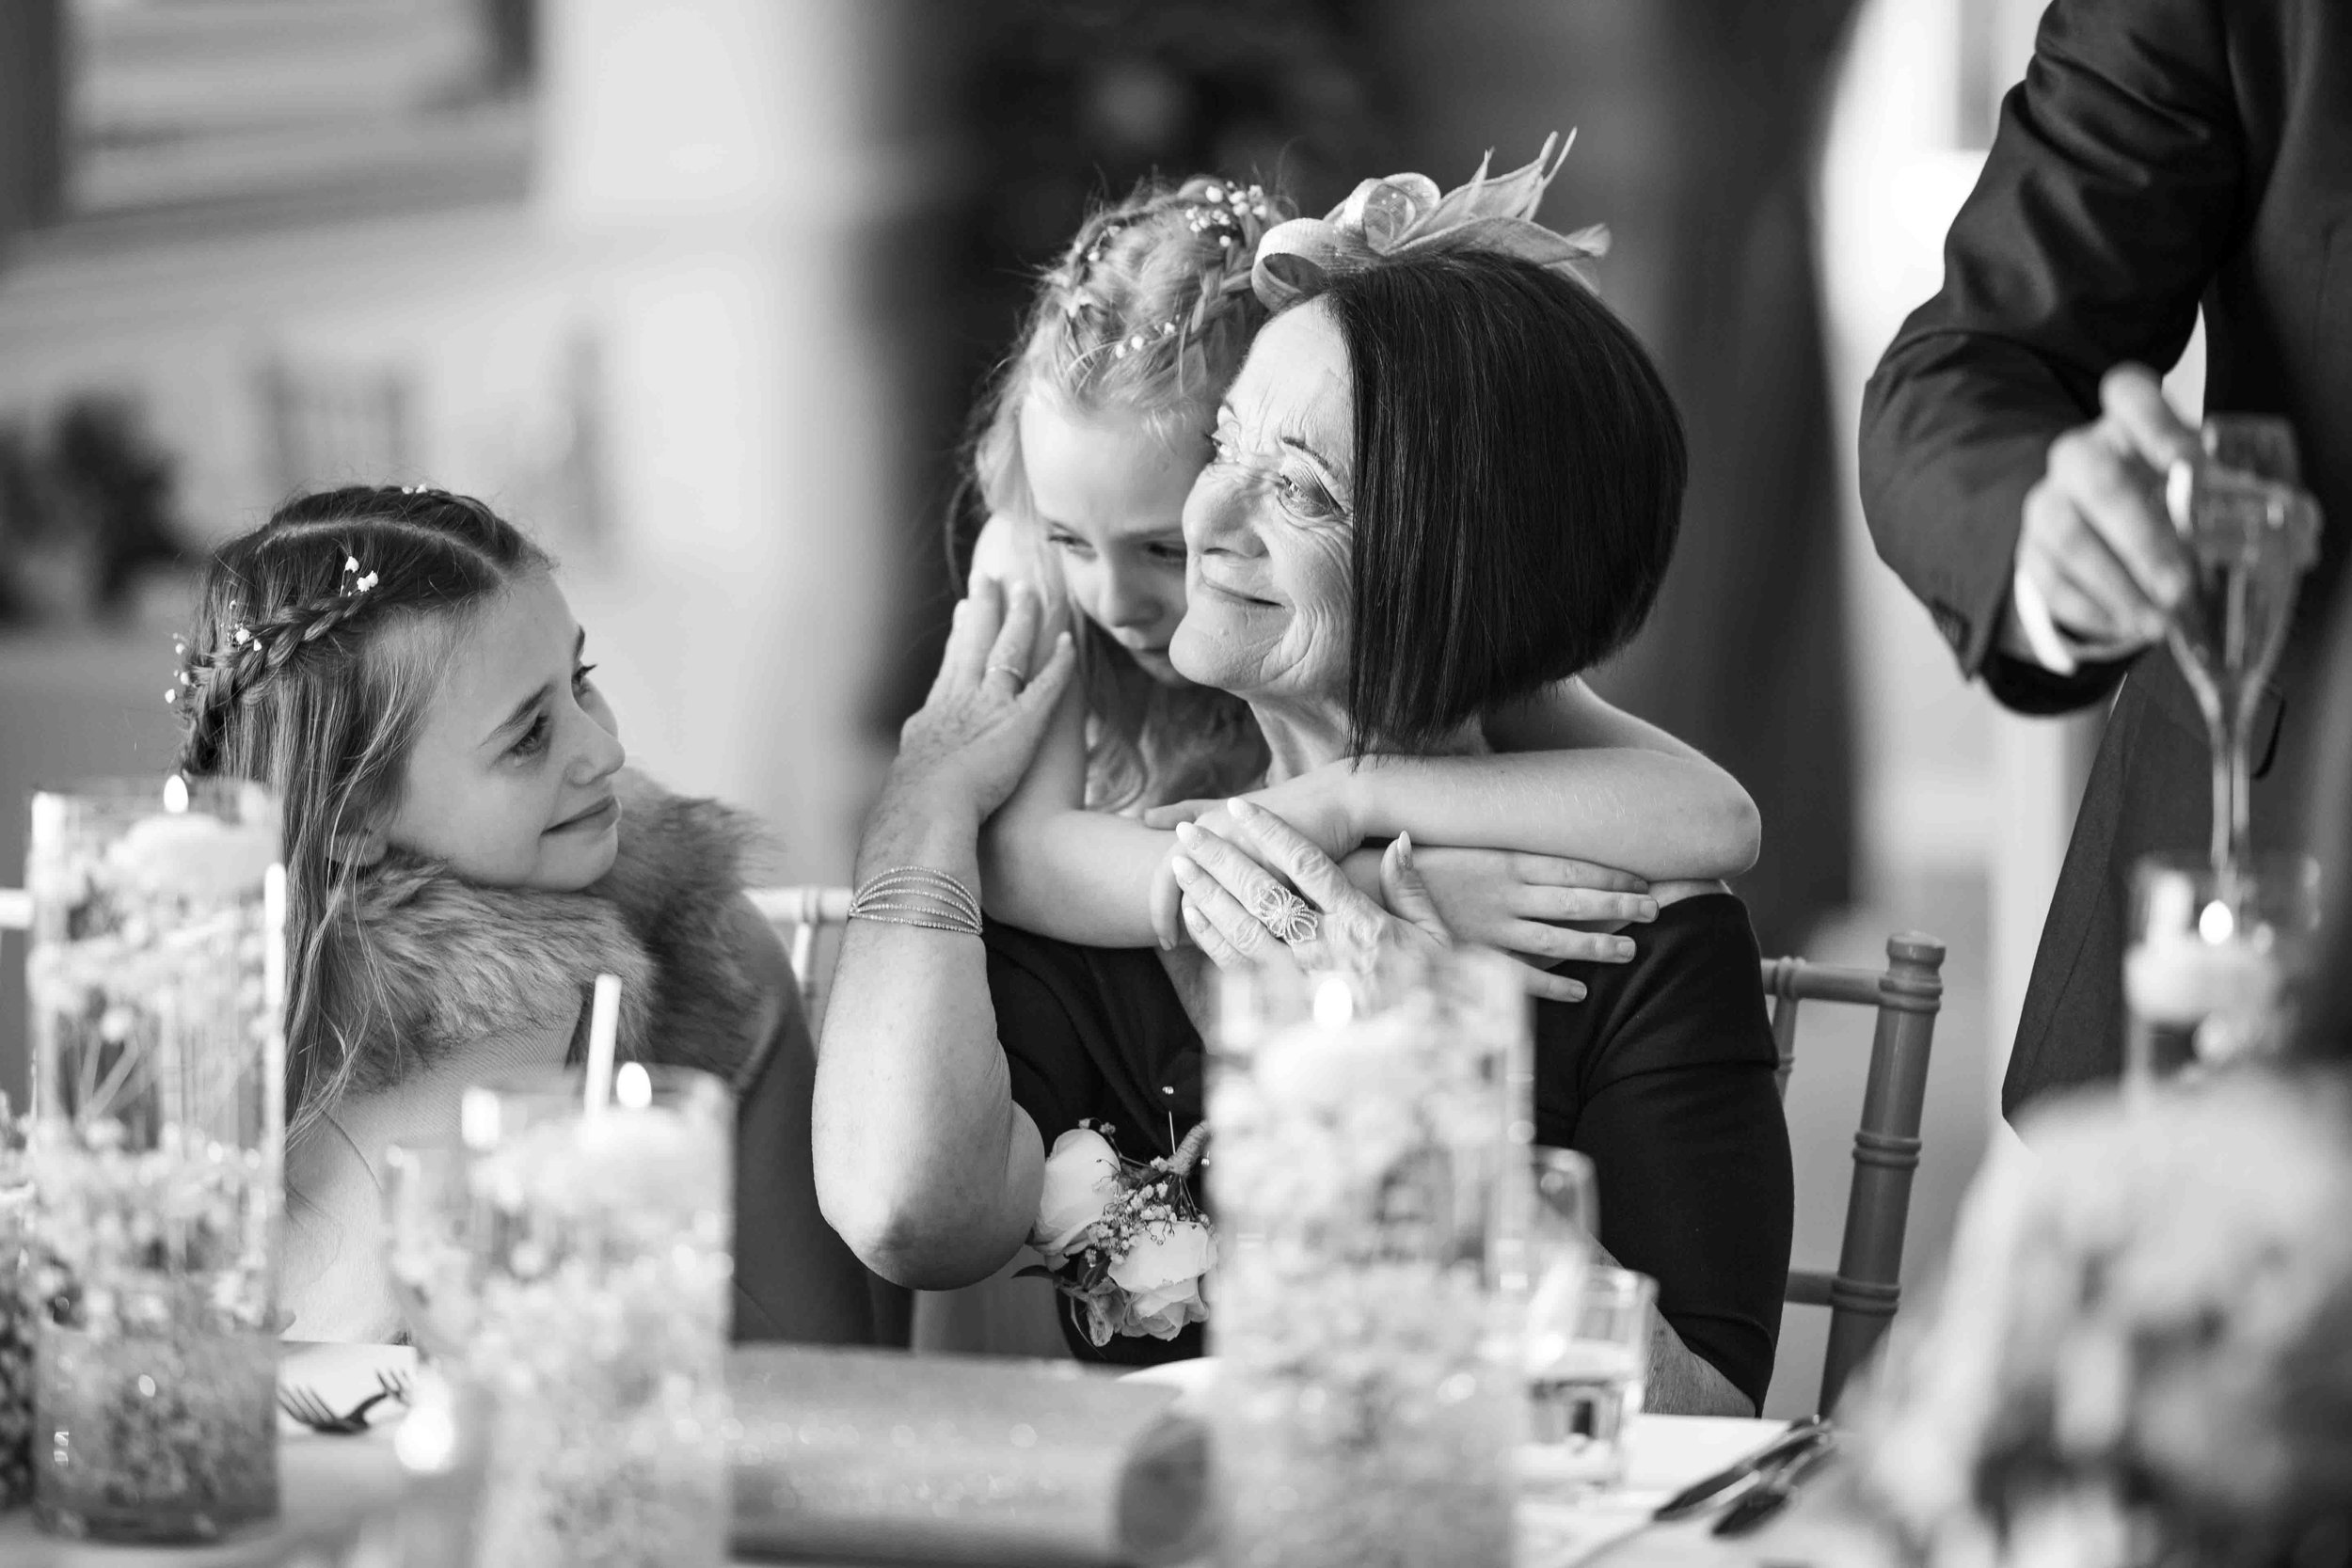 wedding-photos-willenhall-wedding-photographer-wolverhampton-wedding-photographer-west-midlands-wedding-photographer-birmingham-emotional-hug.jpg